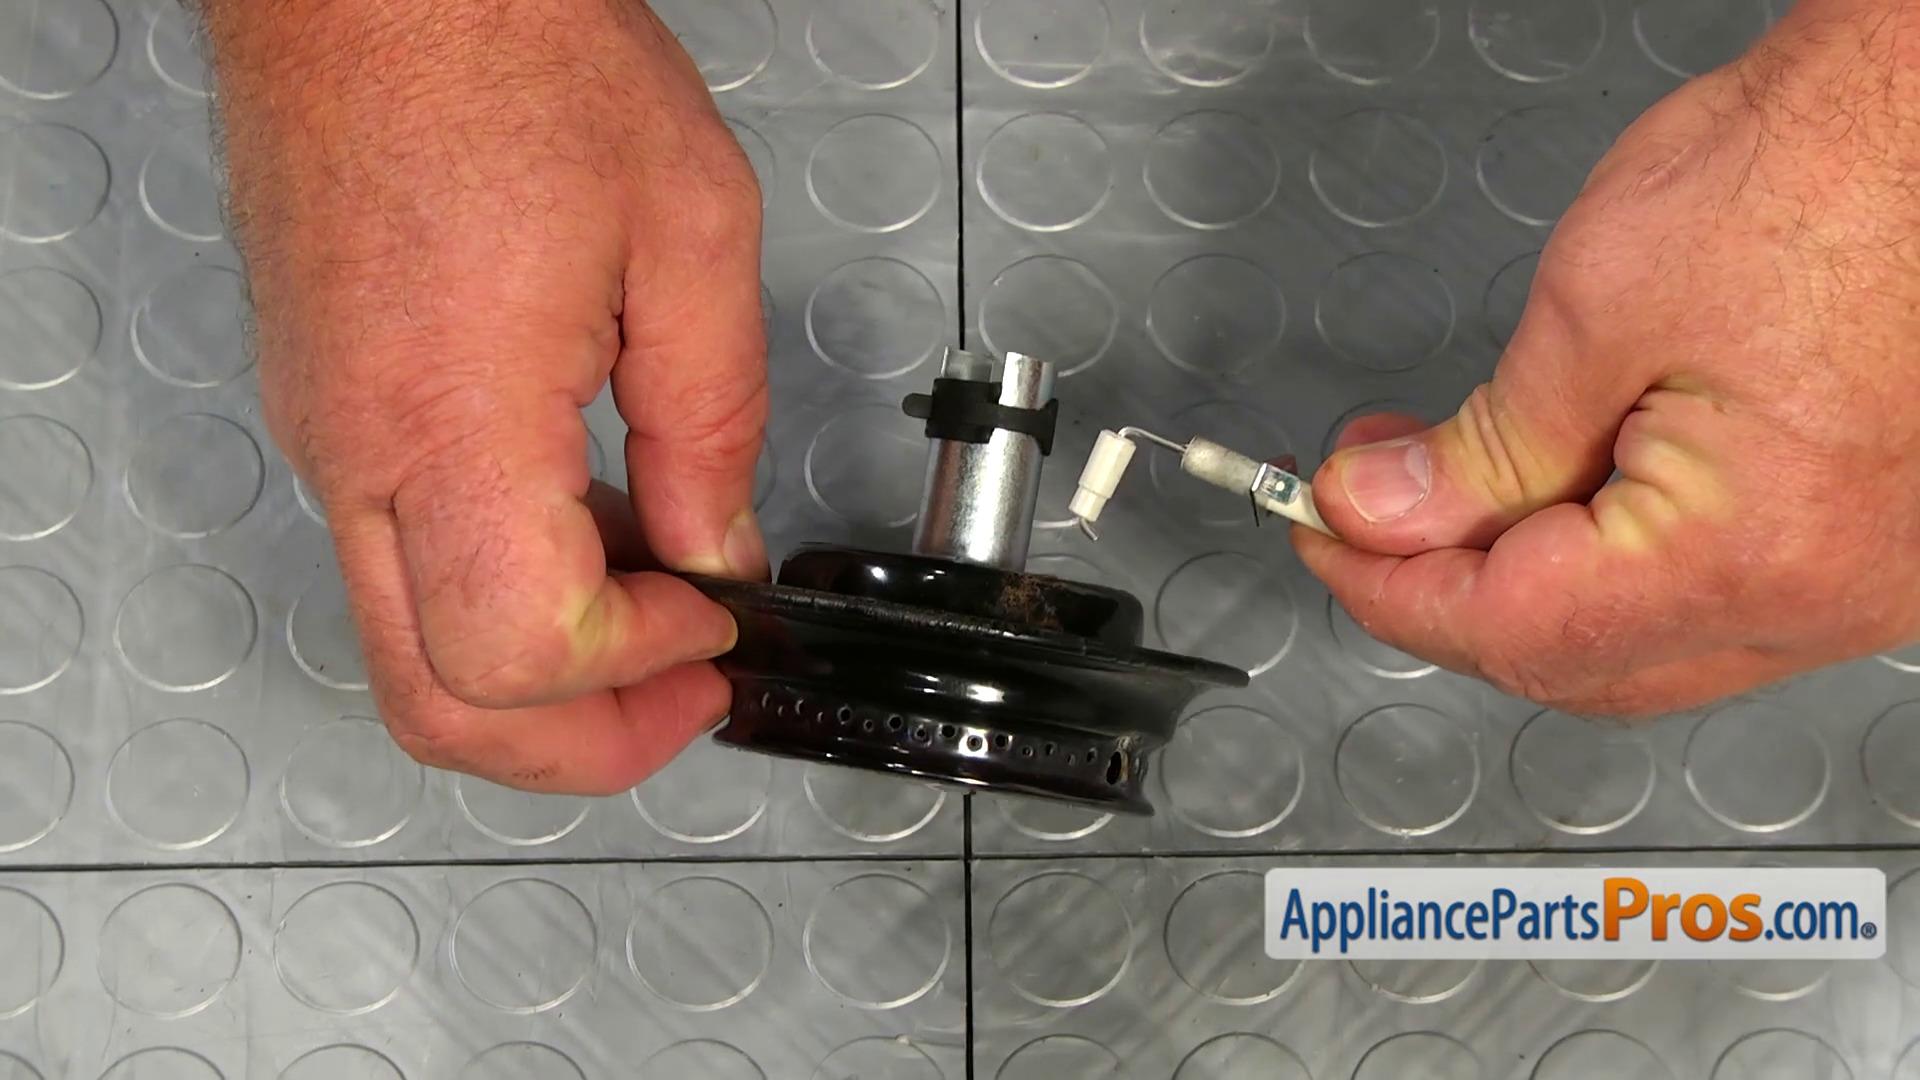 ae9c476bc25699dfc7d73962516c6fcbe59af117?image_crop_resized=640x360 whirlpool 74004053 top burner spark igniter appliancepartspros com JDS9860AAP Specs at creativeand.co